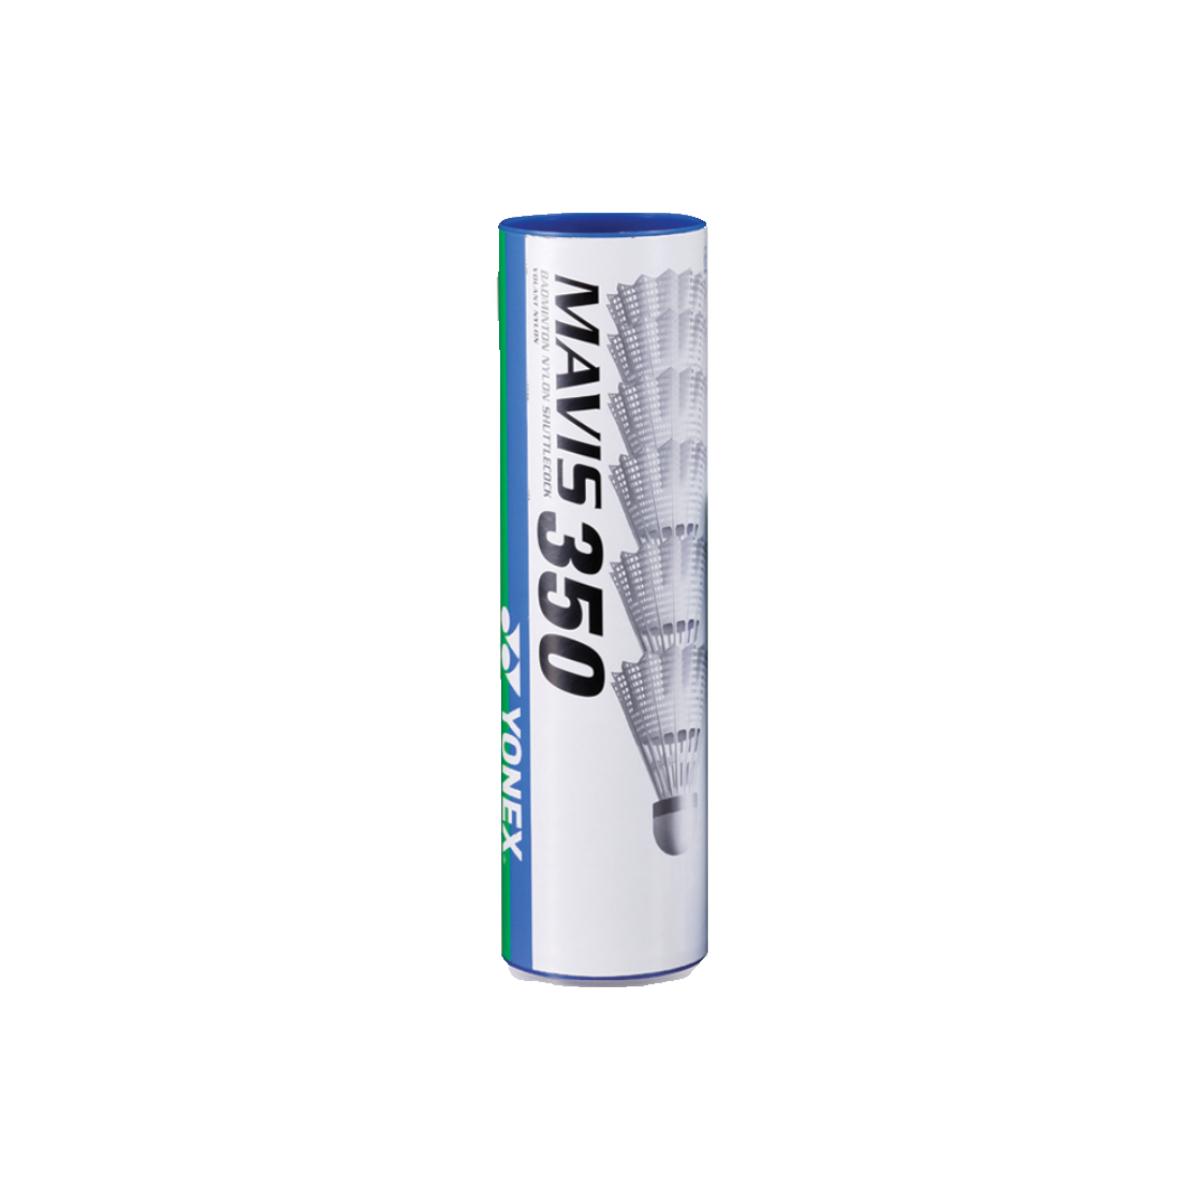 YONEX - Nylonfederball MAVIS-350Detailbild - 1